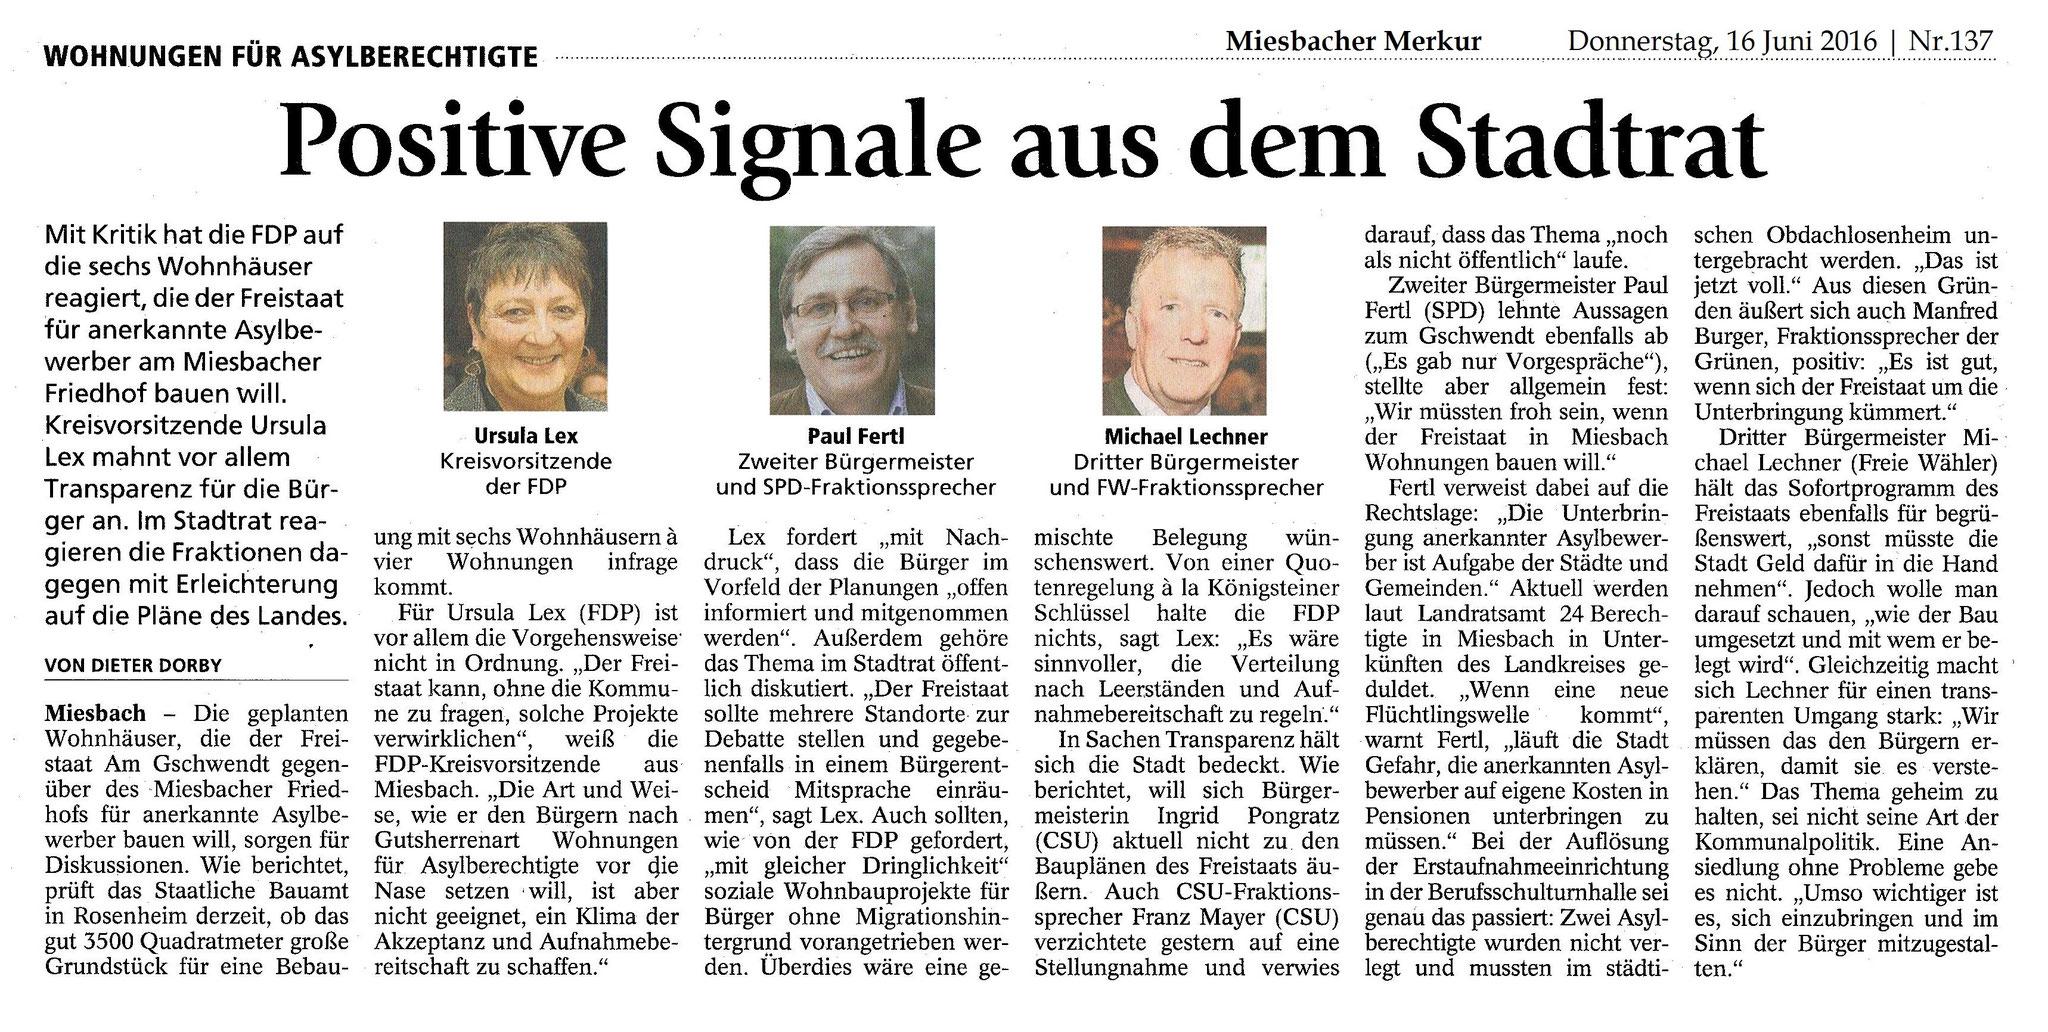 16. Juni 2016: Positive Signale aus dem Stadtrat (.jpg)